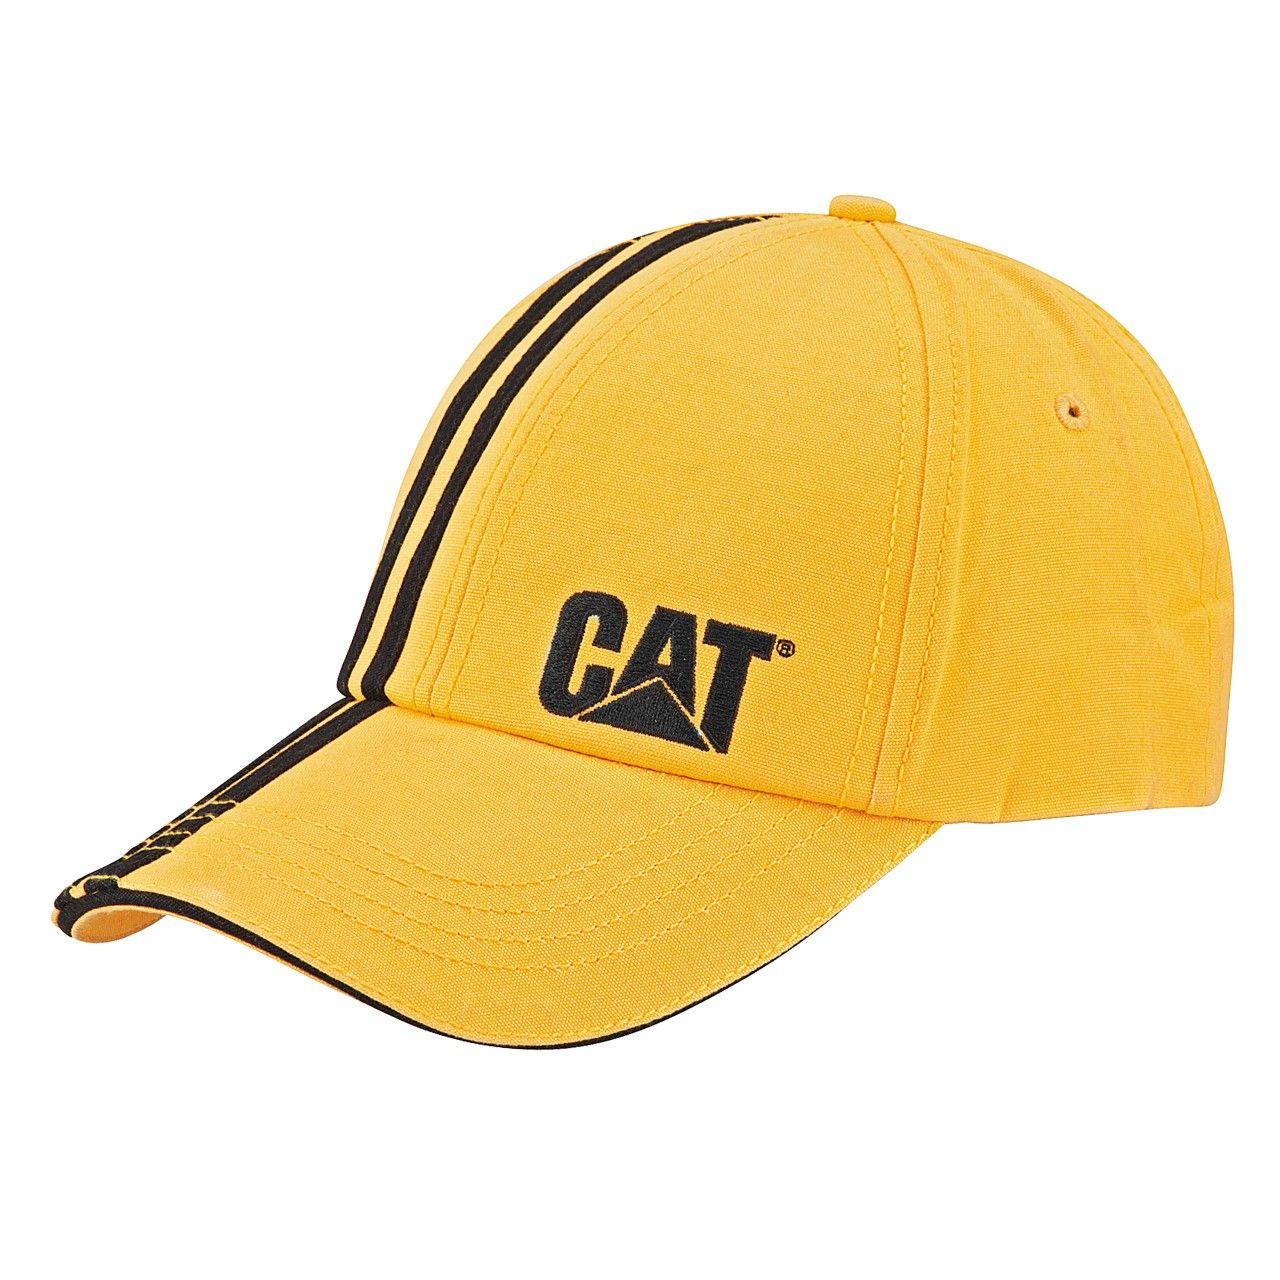 374.00 - Gorra Caterpillar Diseño clásico con el logo característico de la  marca. Úsala como complemento de tu atuendo deportivo. 711208c739e